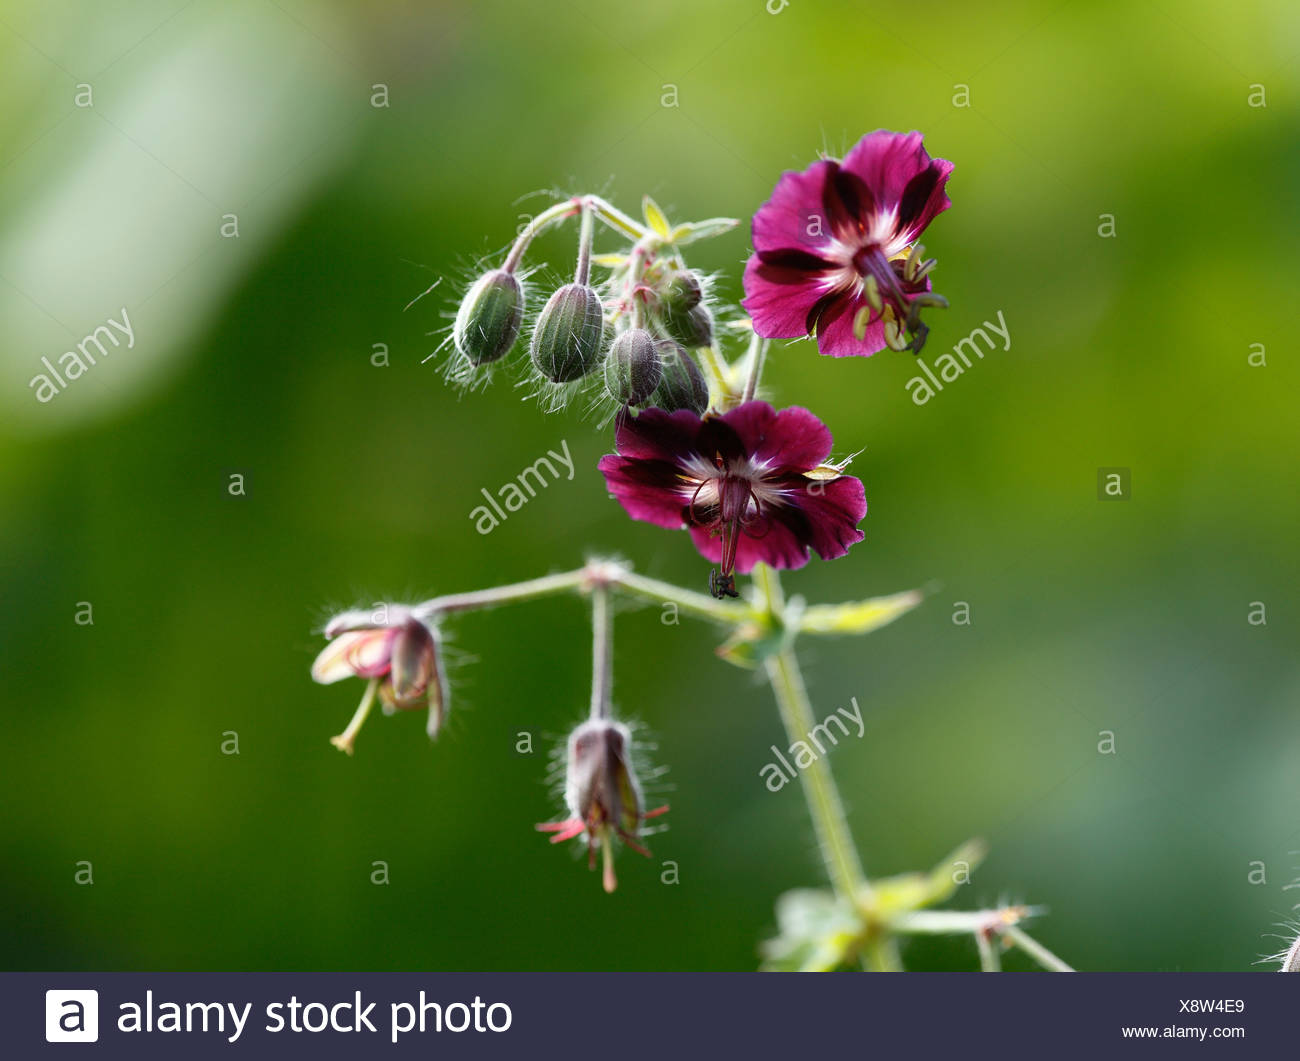 Dusky Cranesbill or Mourning Widow (Geranium phaeum) - Stock Image